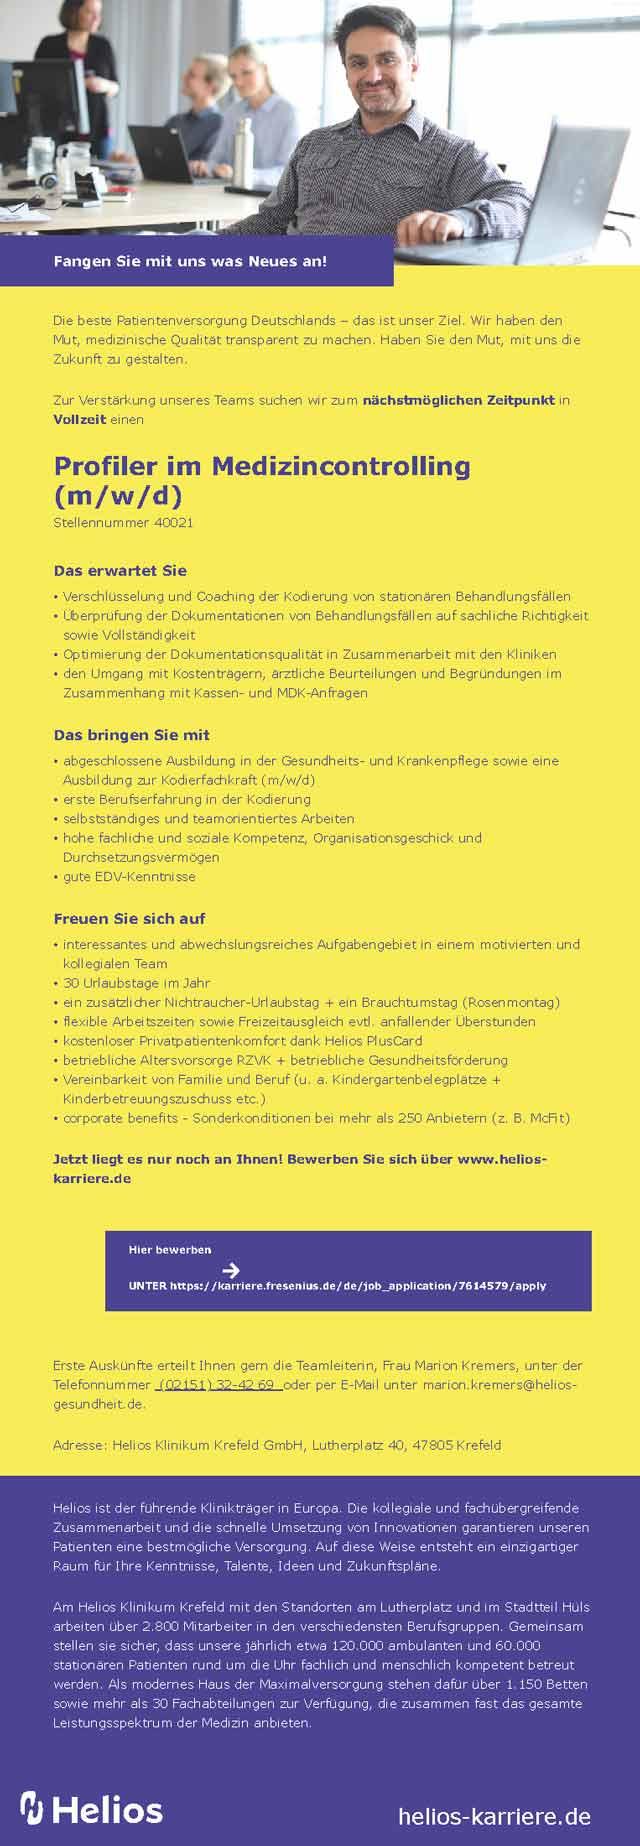 Helios Klinikum Krefeld: Profiler im Medizincontrolling (m/w/d)